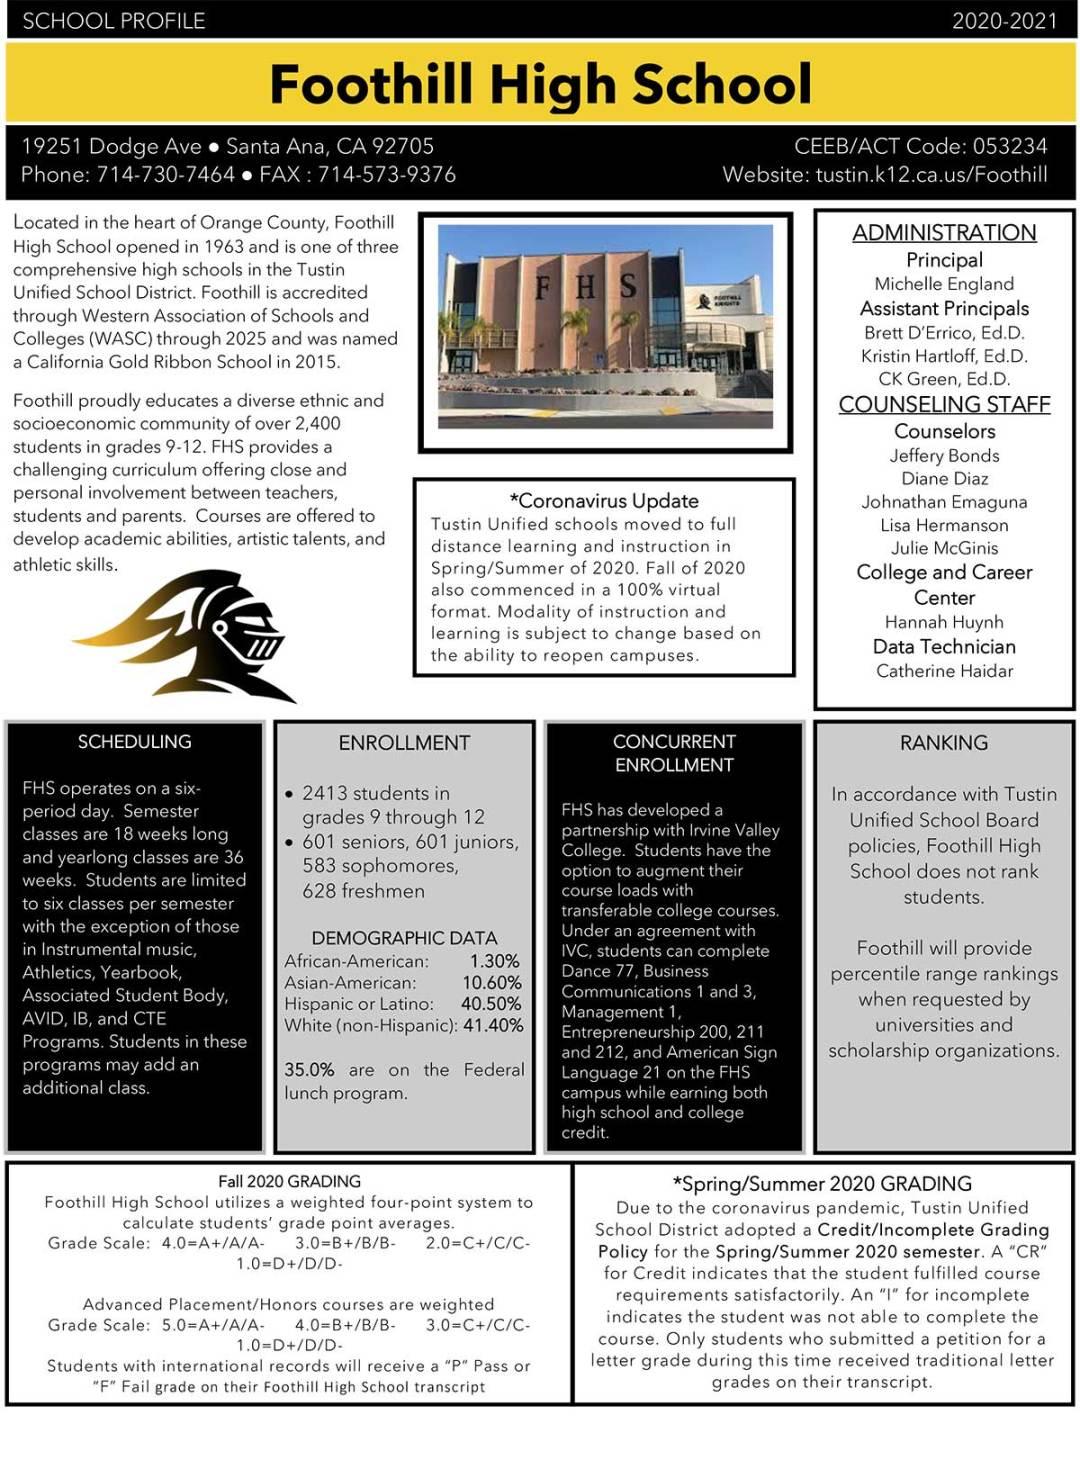 FHS School Profile page 1